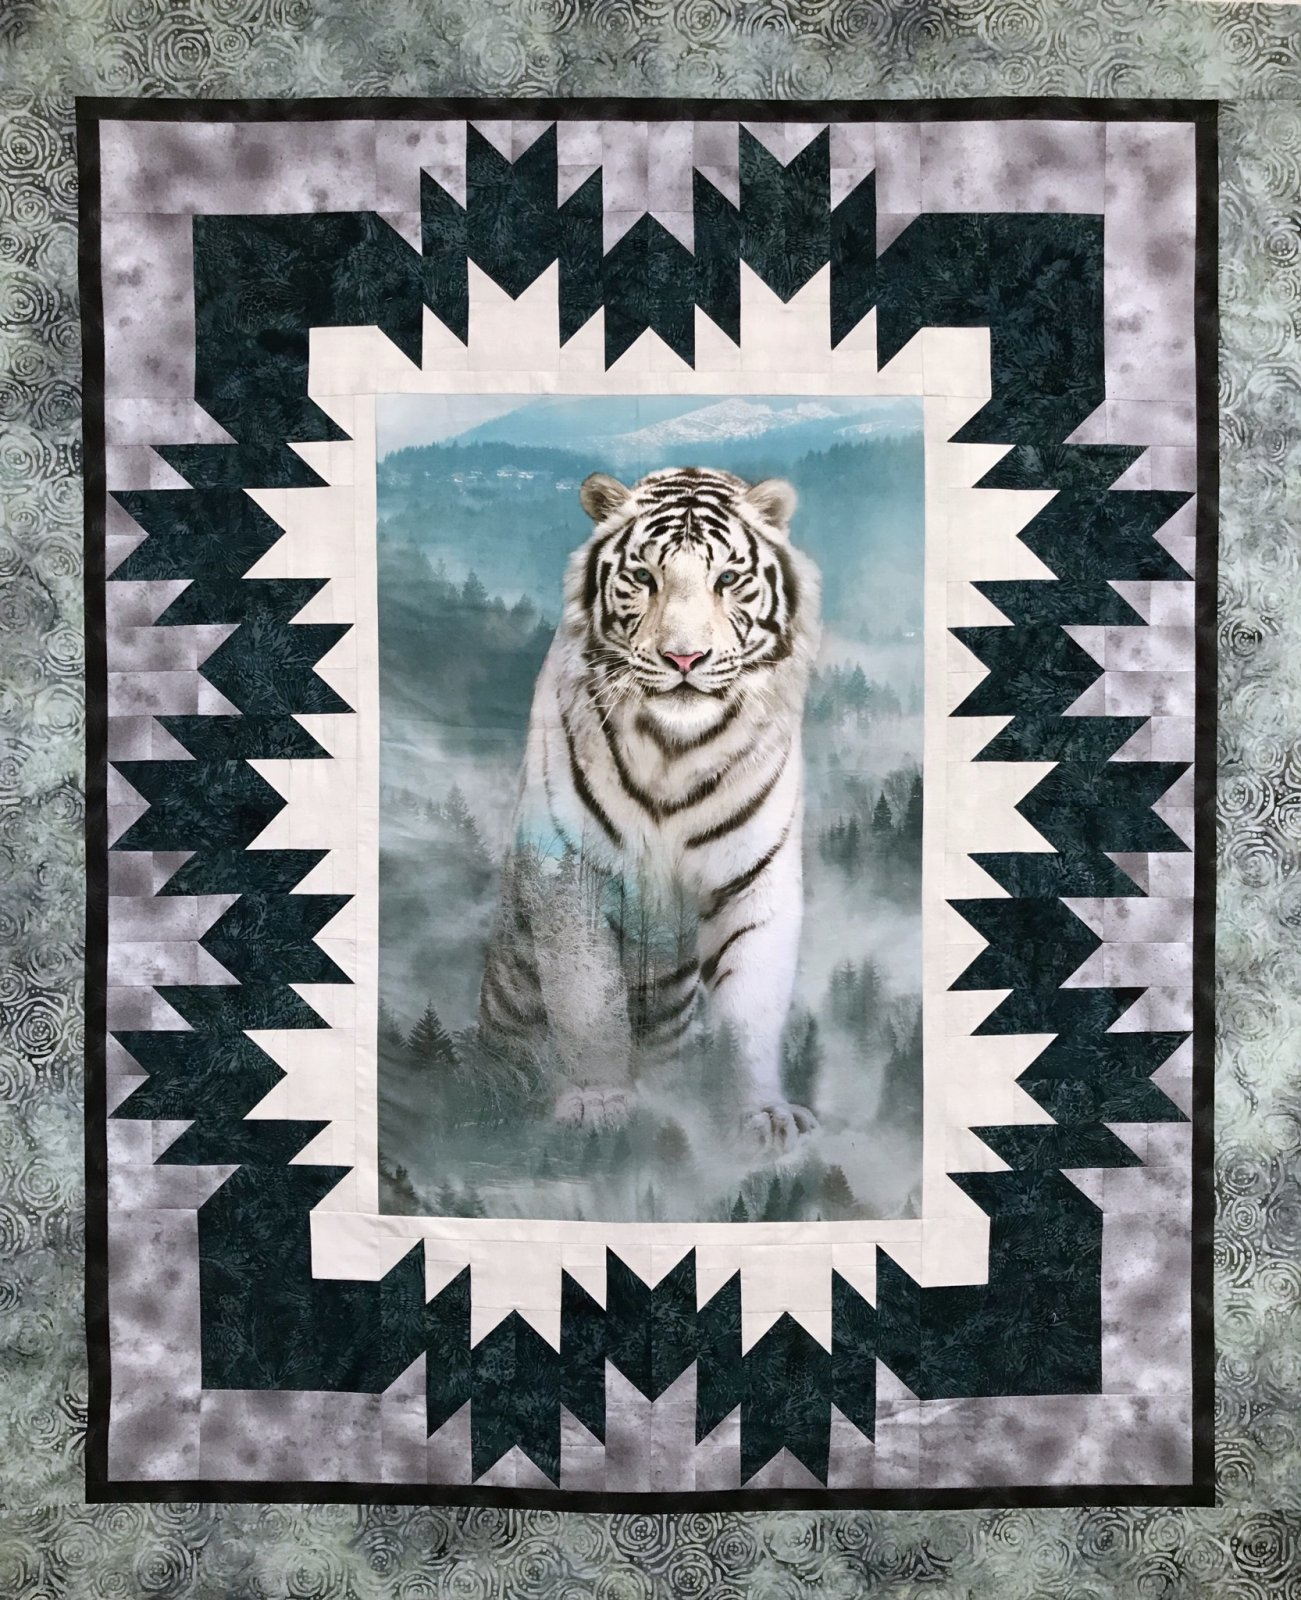 Misty Tiger Panel Quilt